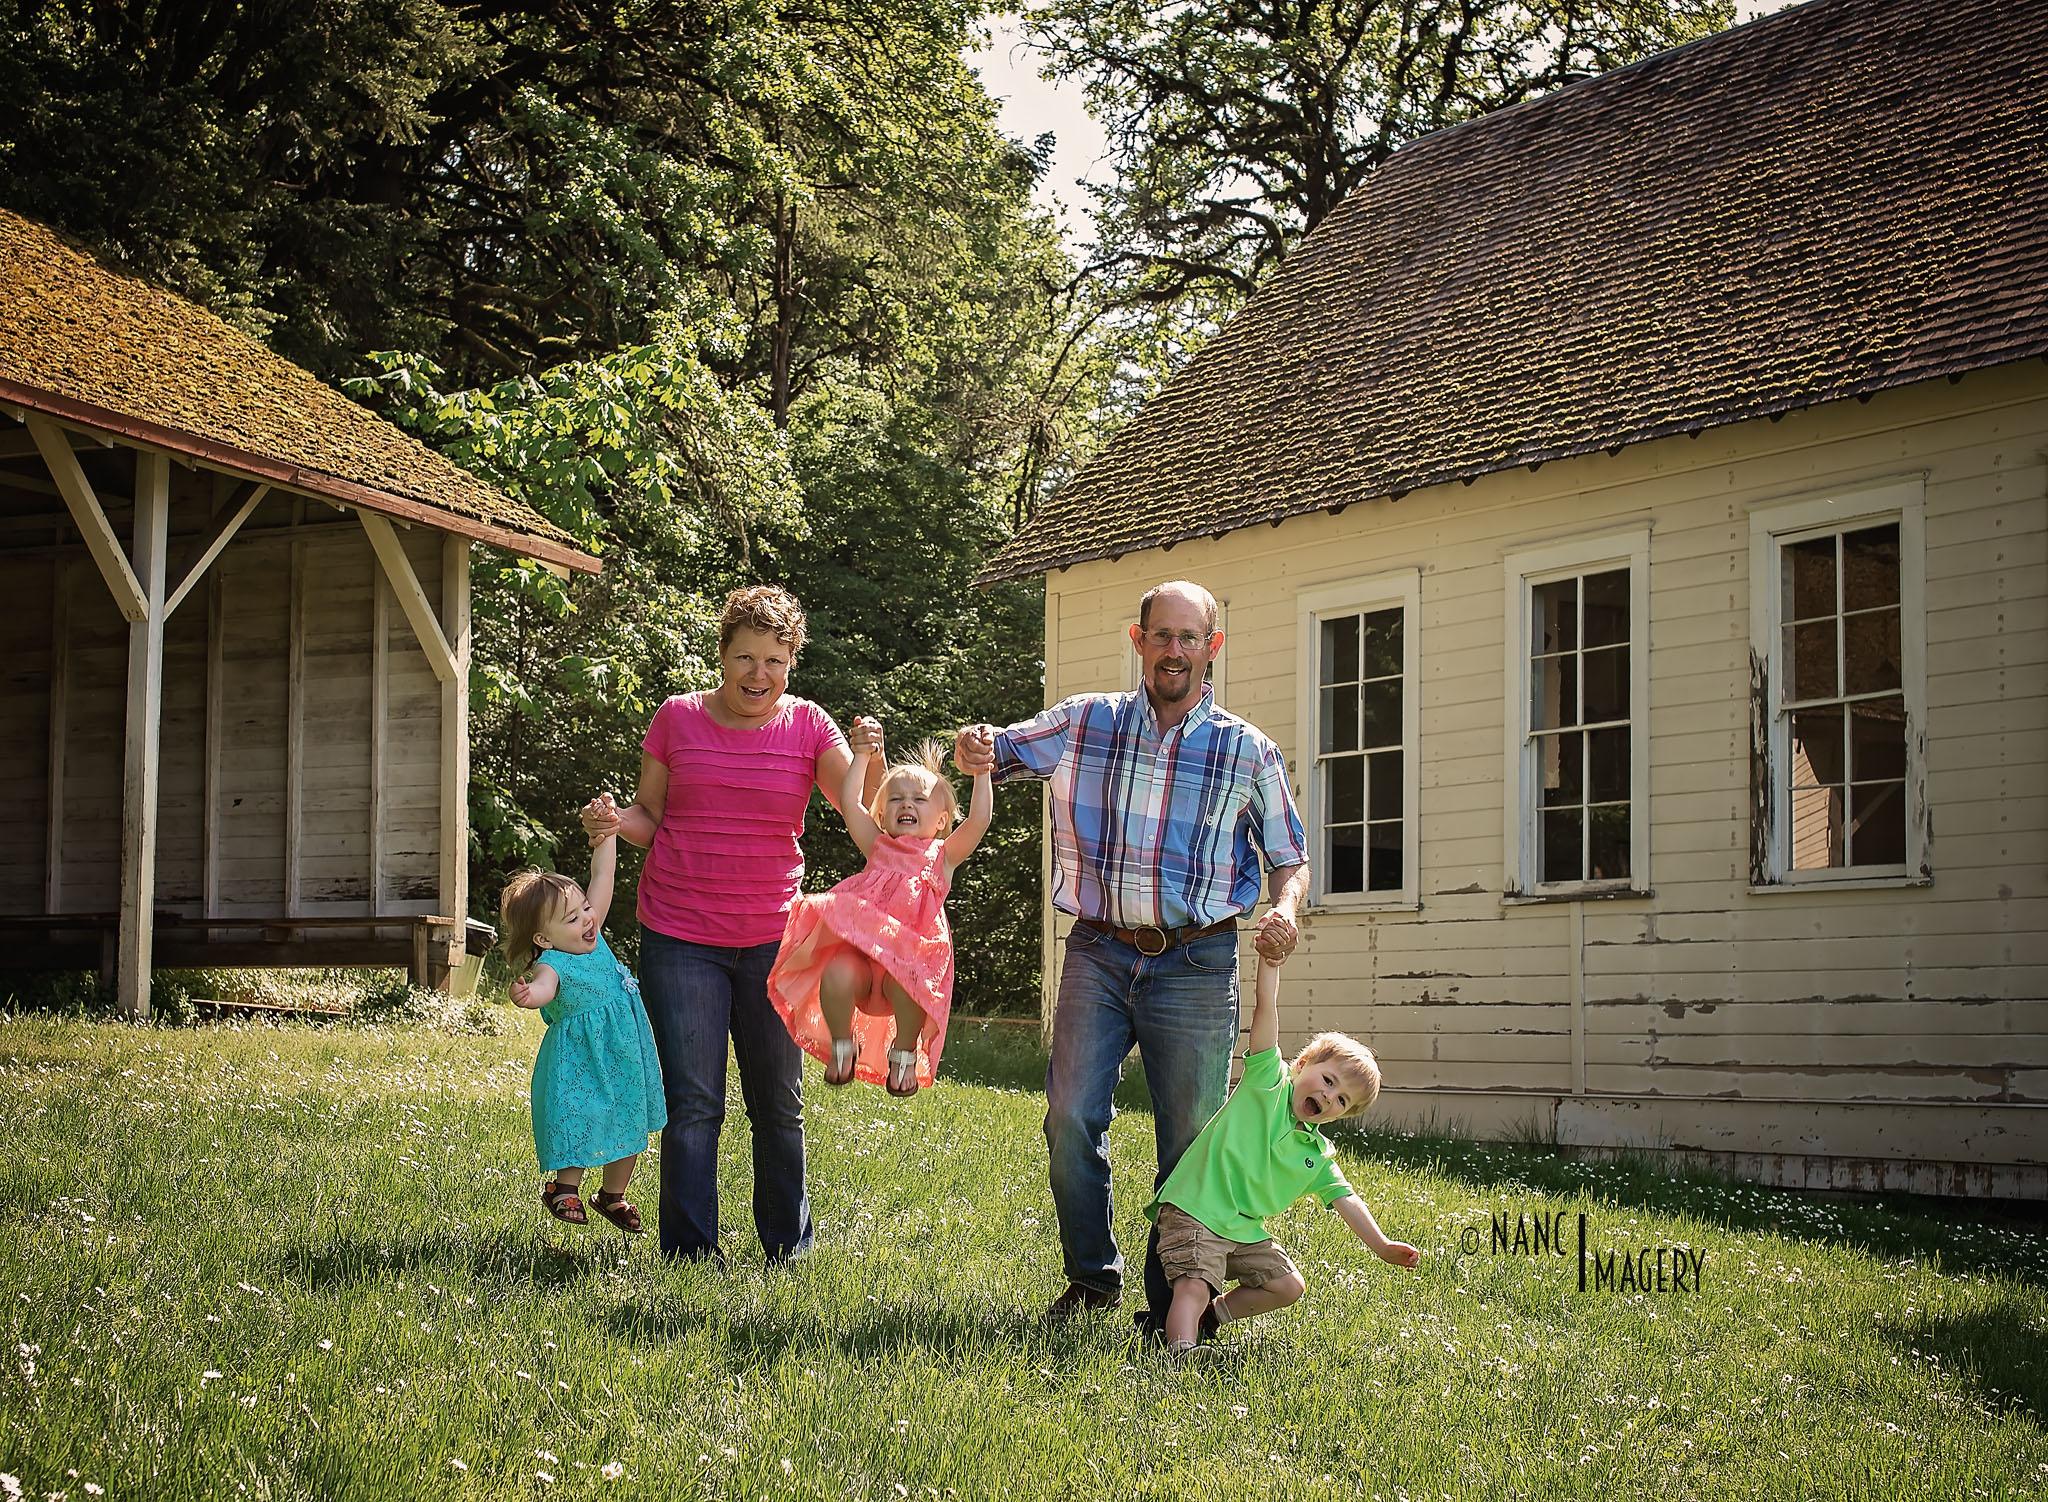 Nanci Imagery, Newberg Photographer, Family Portraits